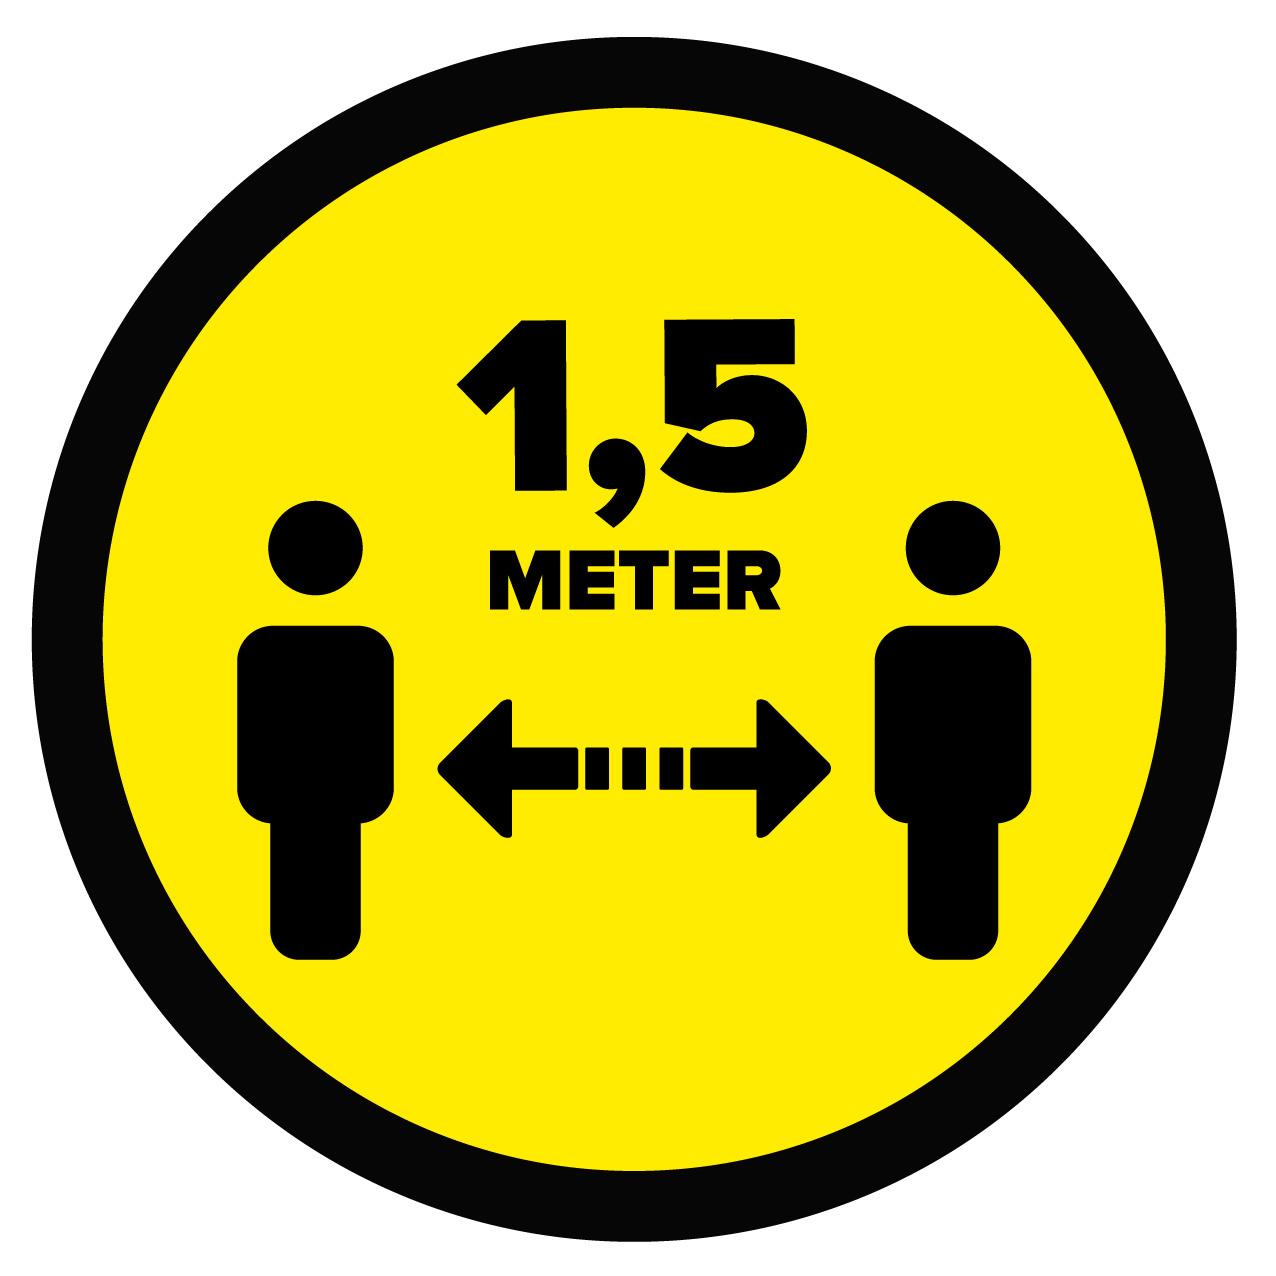 Vloerzeil afstand bewaren 1,5 Meter